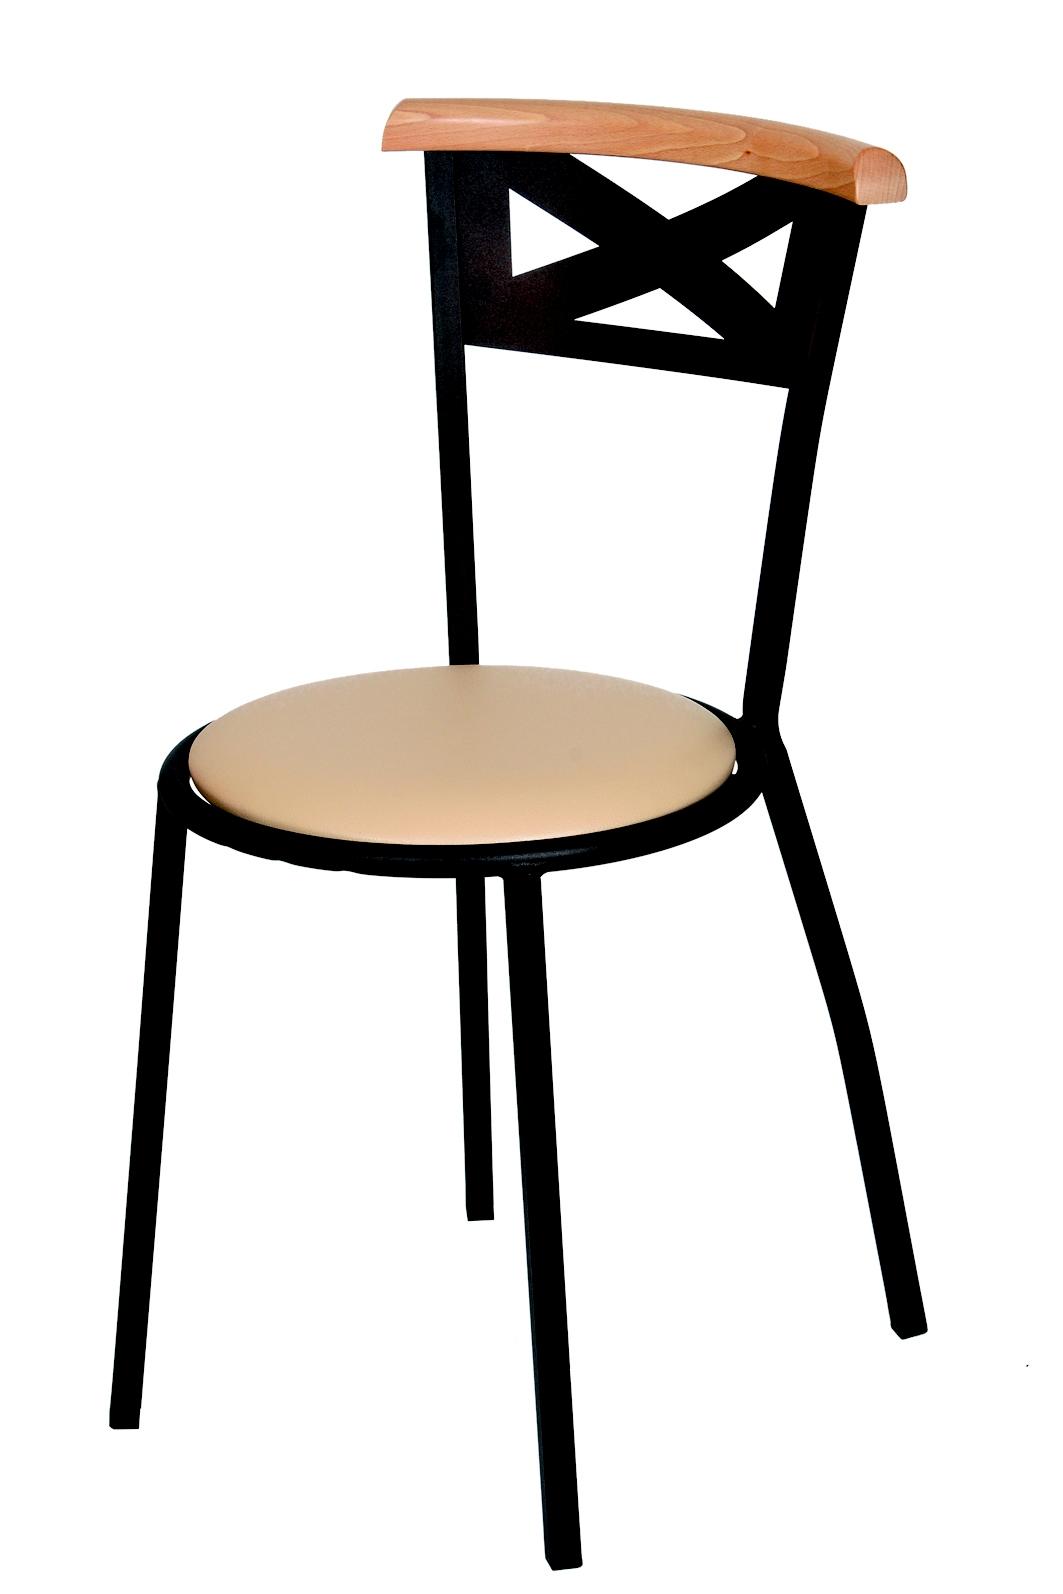 Rodet produits chaises empilables for Chaises empilables